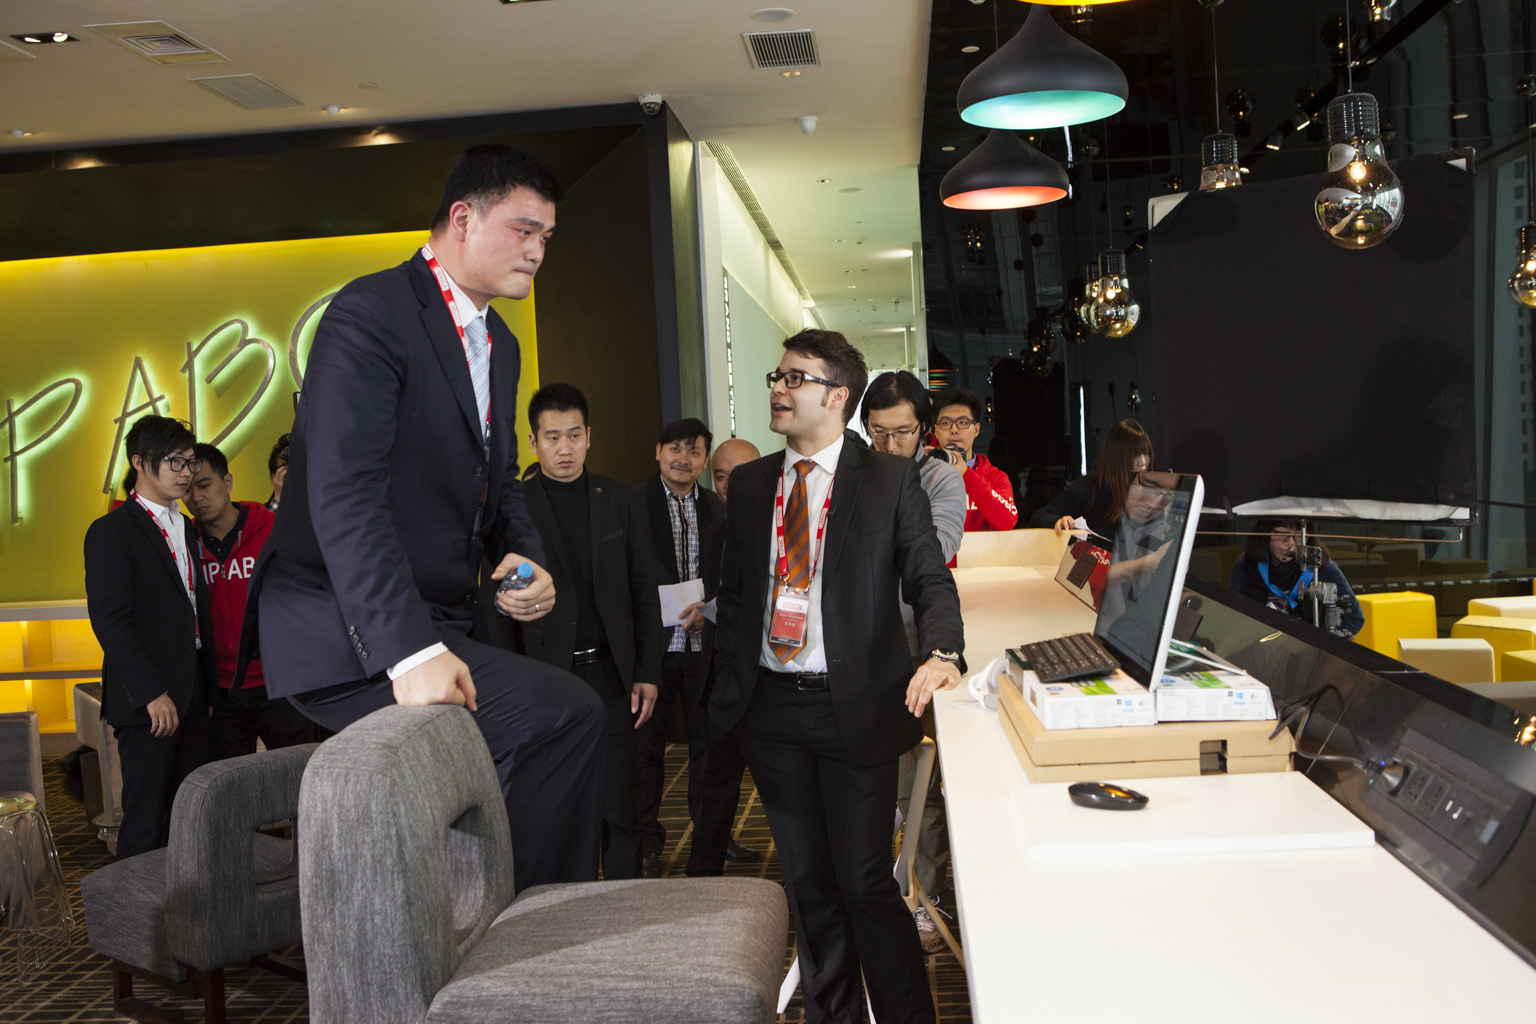 TutorGroup 榮獲2014中國年度城市最佳雇主China Best Employer Award-TutorABC延攬台灣高科技專業人才 進軍國際(3)